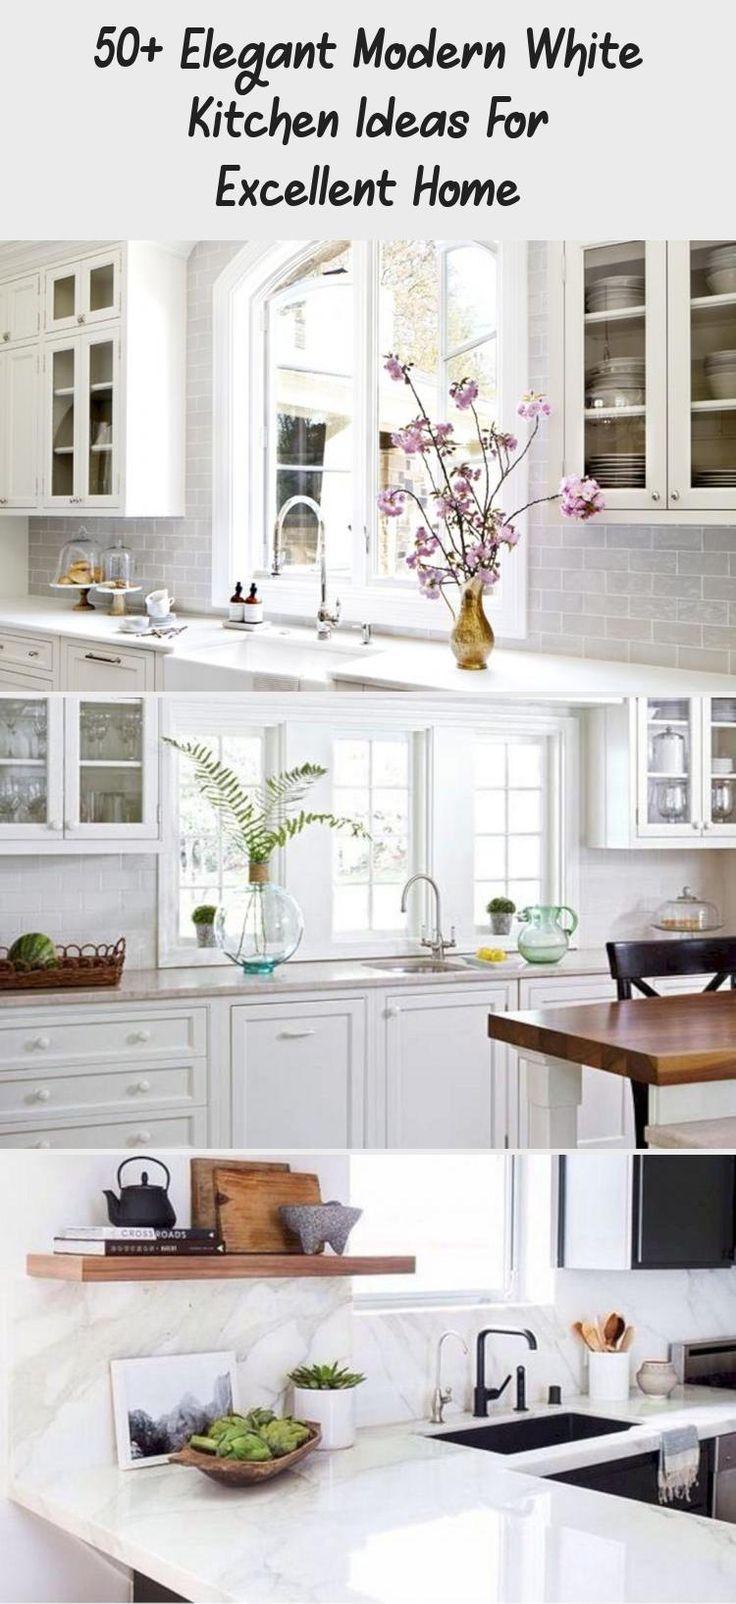 50 elegant modern white kitchen ideas for excellent home 909 modernkitchendesignwhite on kitchen ideas elegant id=78998